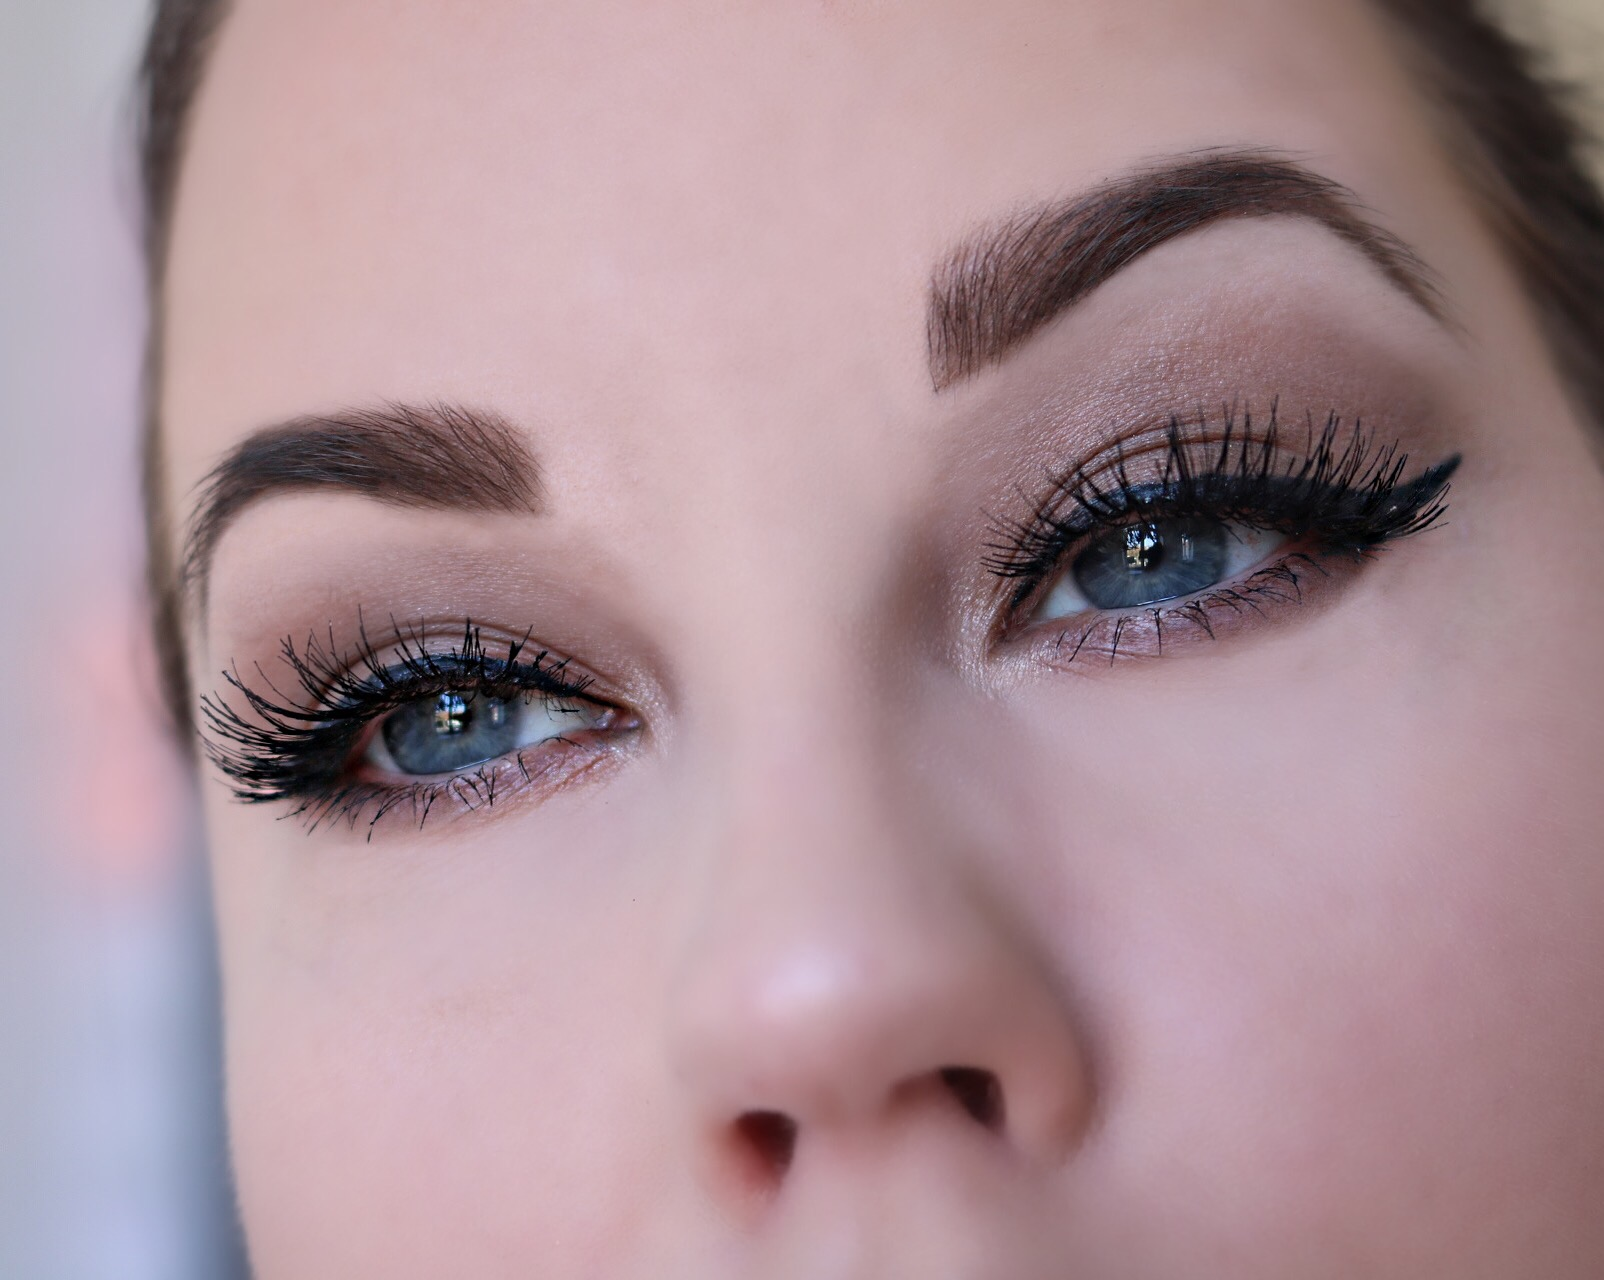 Brun sotning winged eyeliner amandahans skönhetsblogg